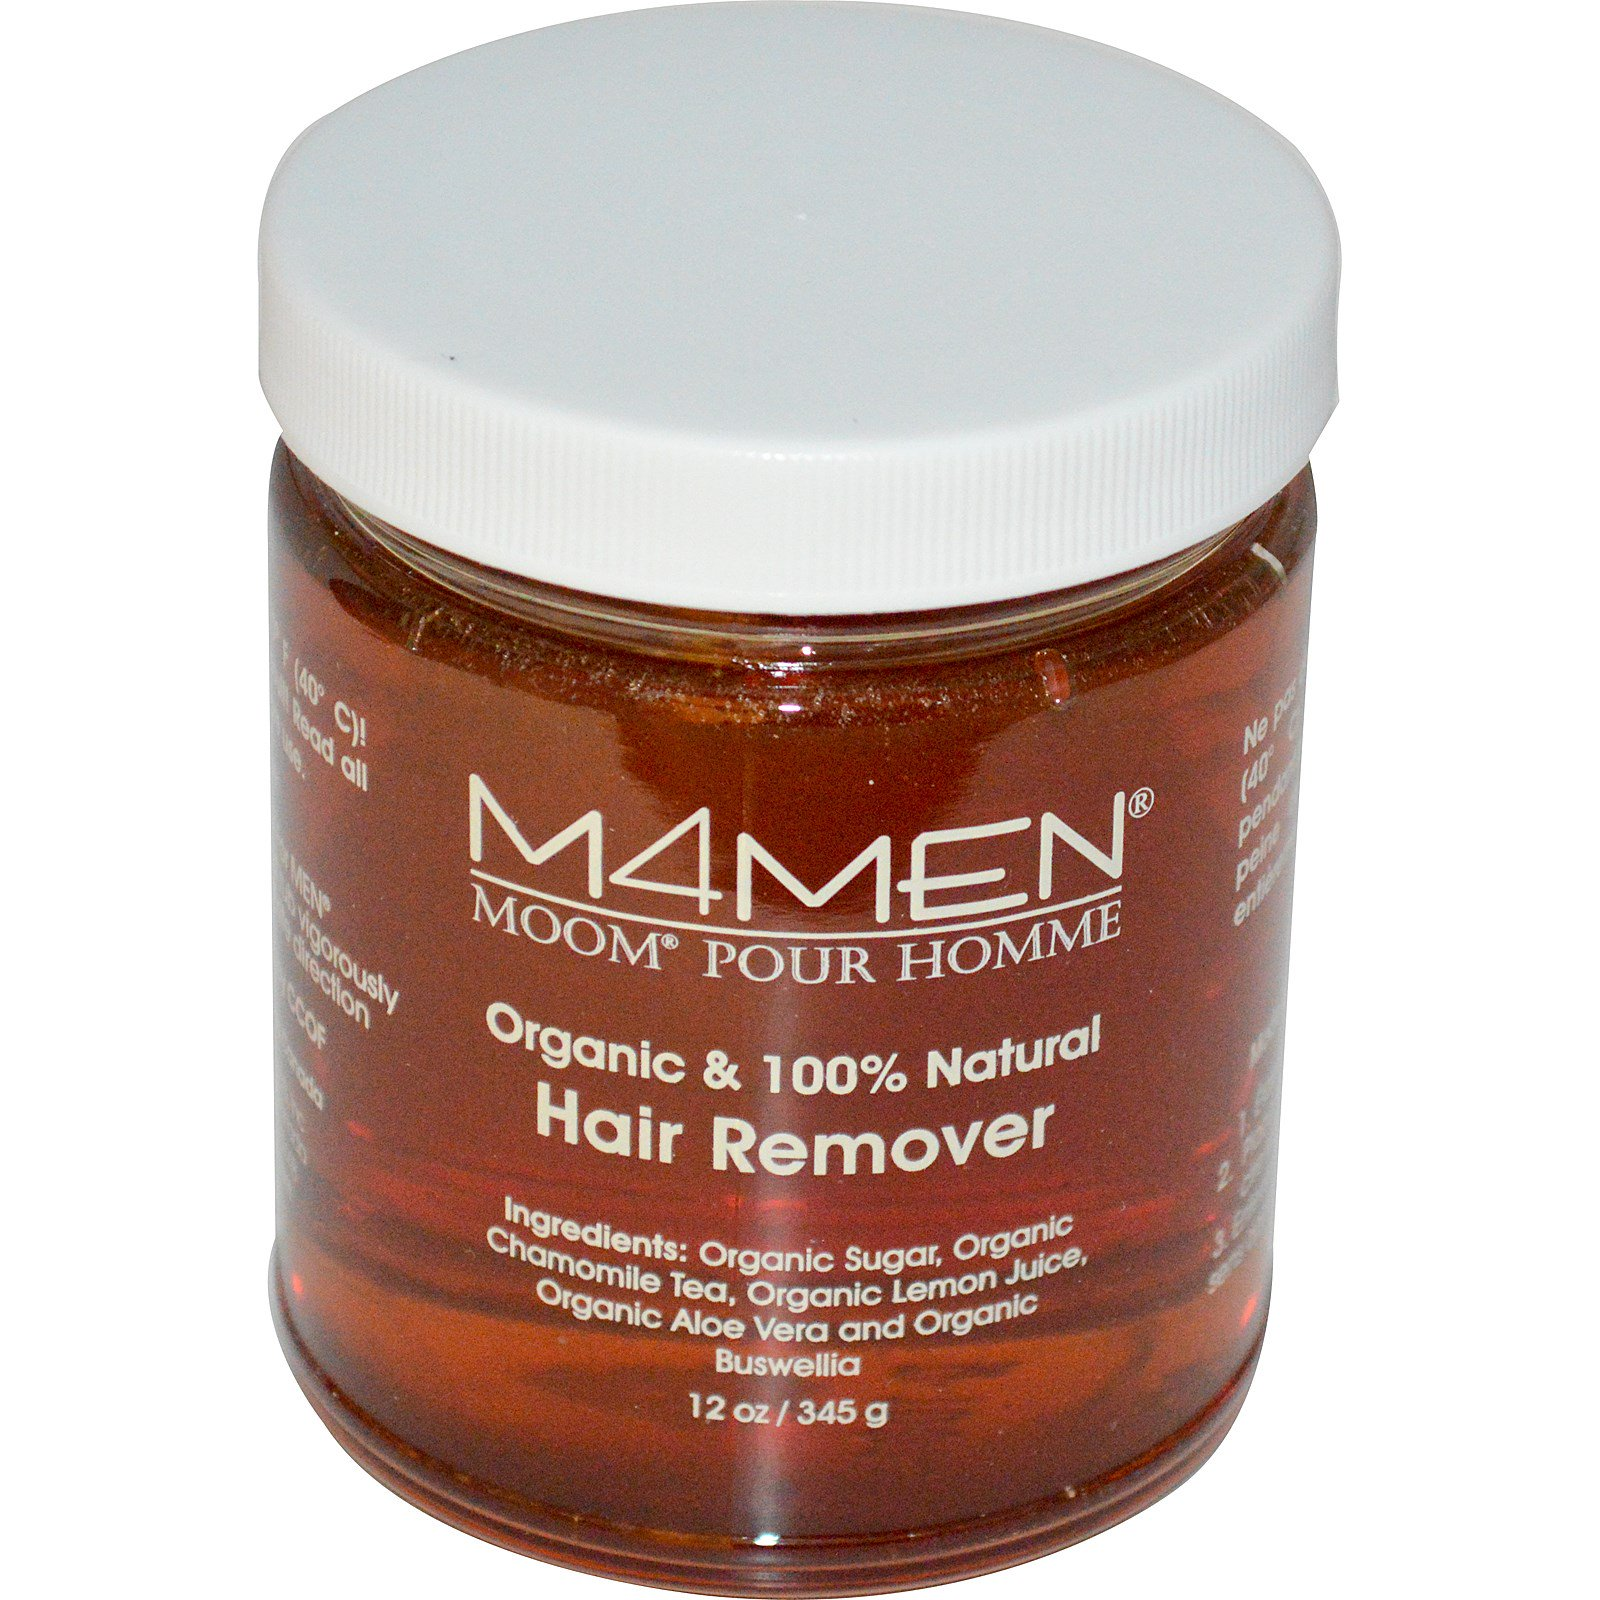 Moom, M4Men, Средство для удаления волос у мужчин, 12 унций (345 g)